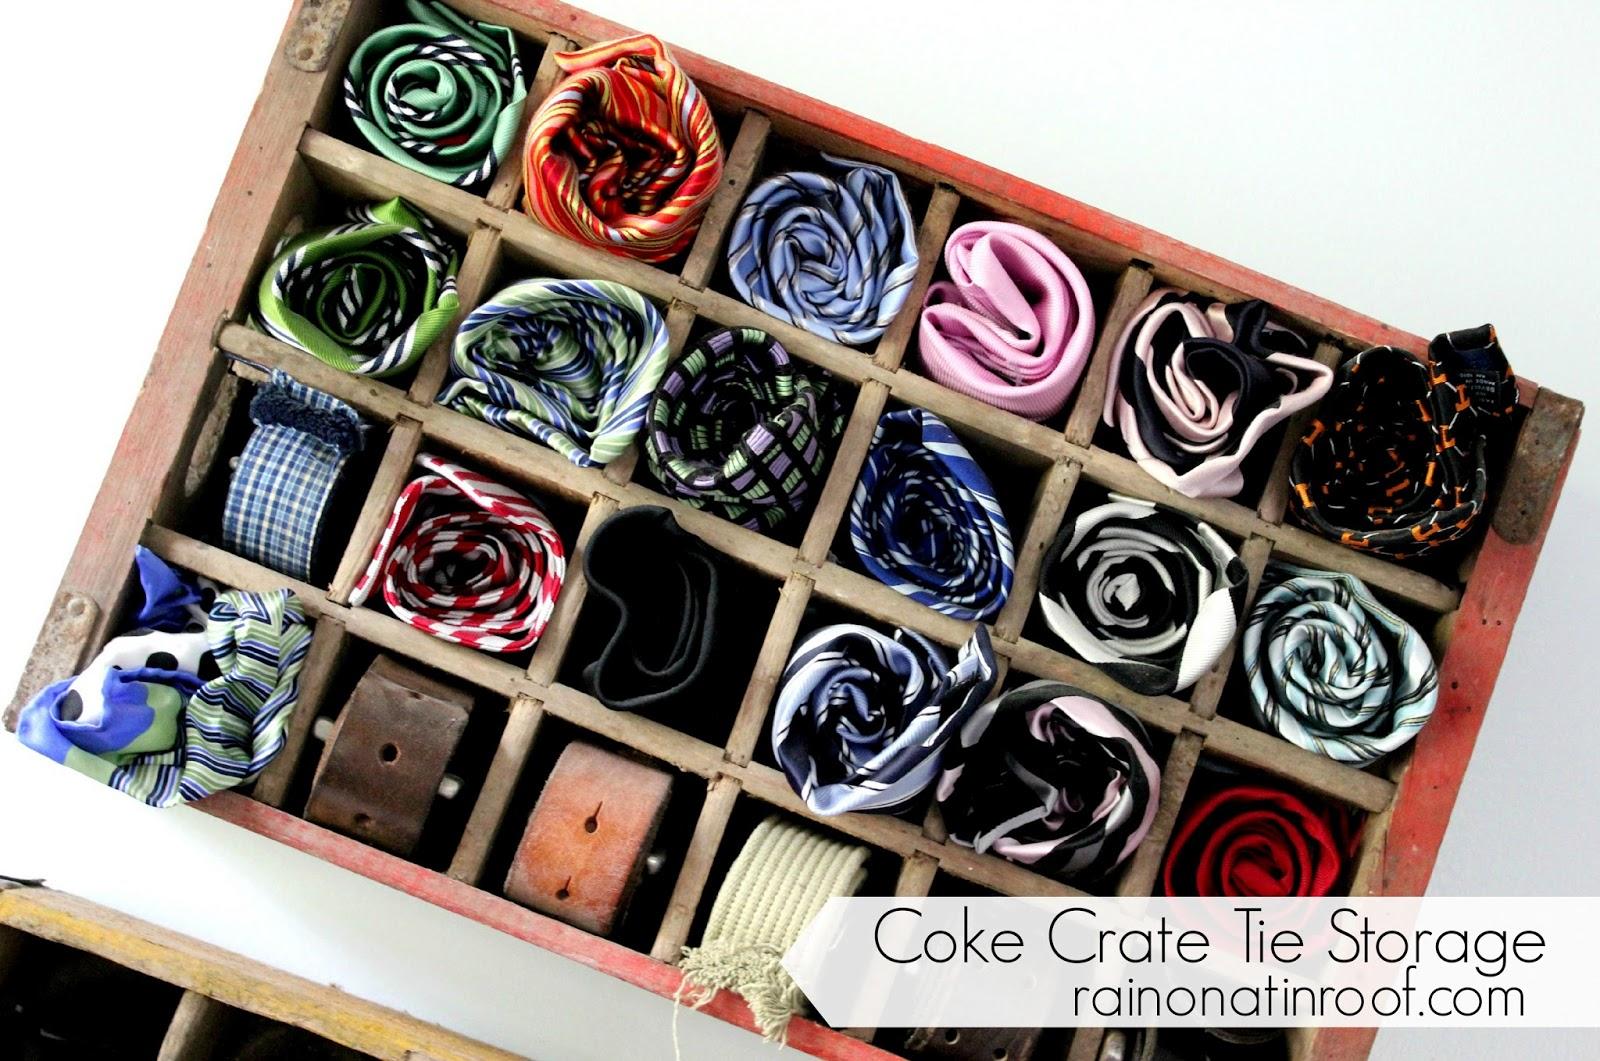 Coke Crate Tie Storage {rainonatinroof.com} #coke #crate #tie #